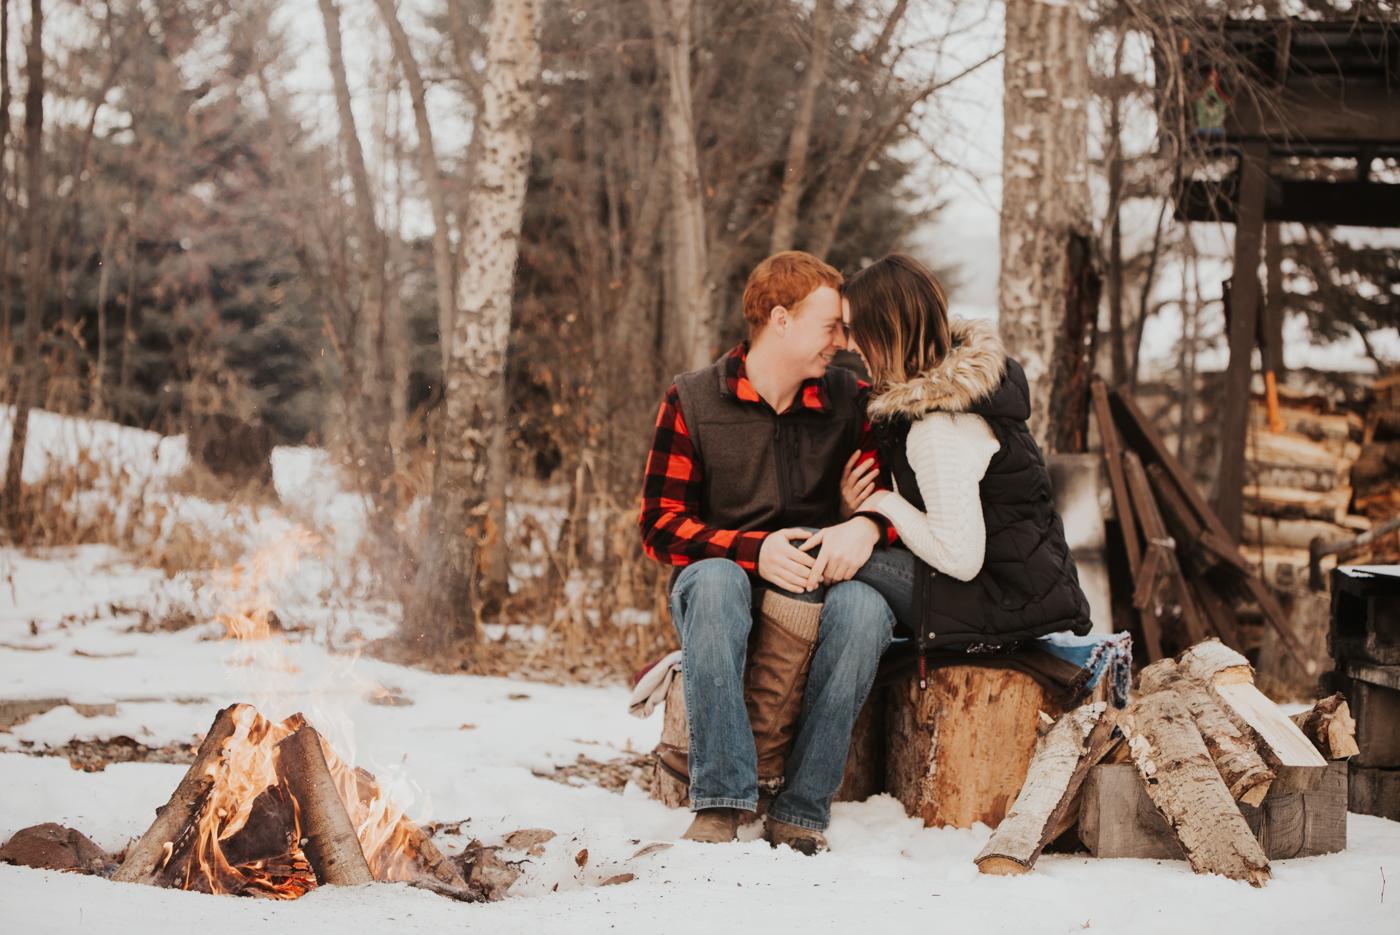 FortSt.John_photographer_TyraEPhotography_Wedding_Couple_Family_Photograhy_DawsonCreek_Elopement_Bride_Boduoir_Portraits-1731.jpg